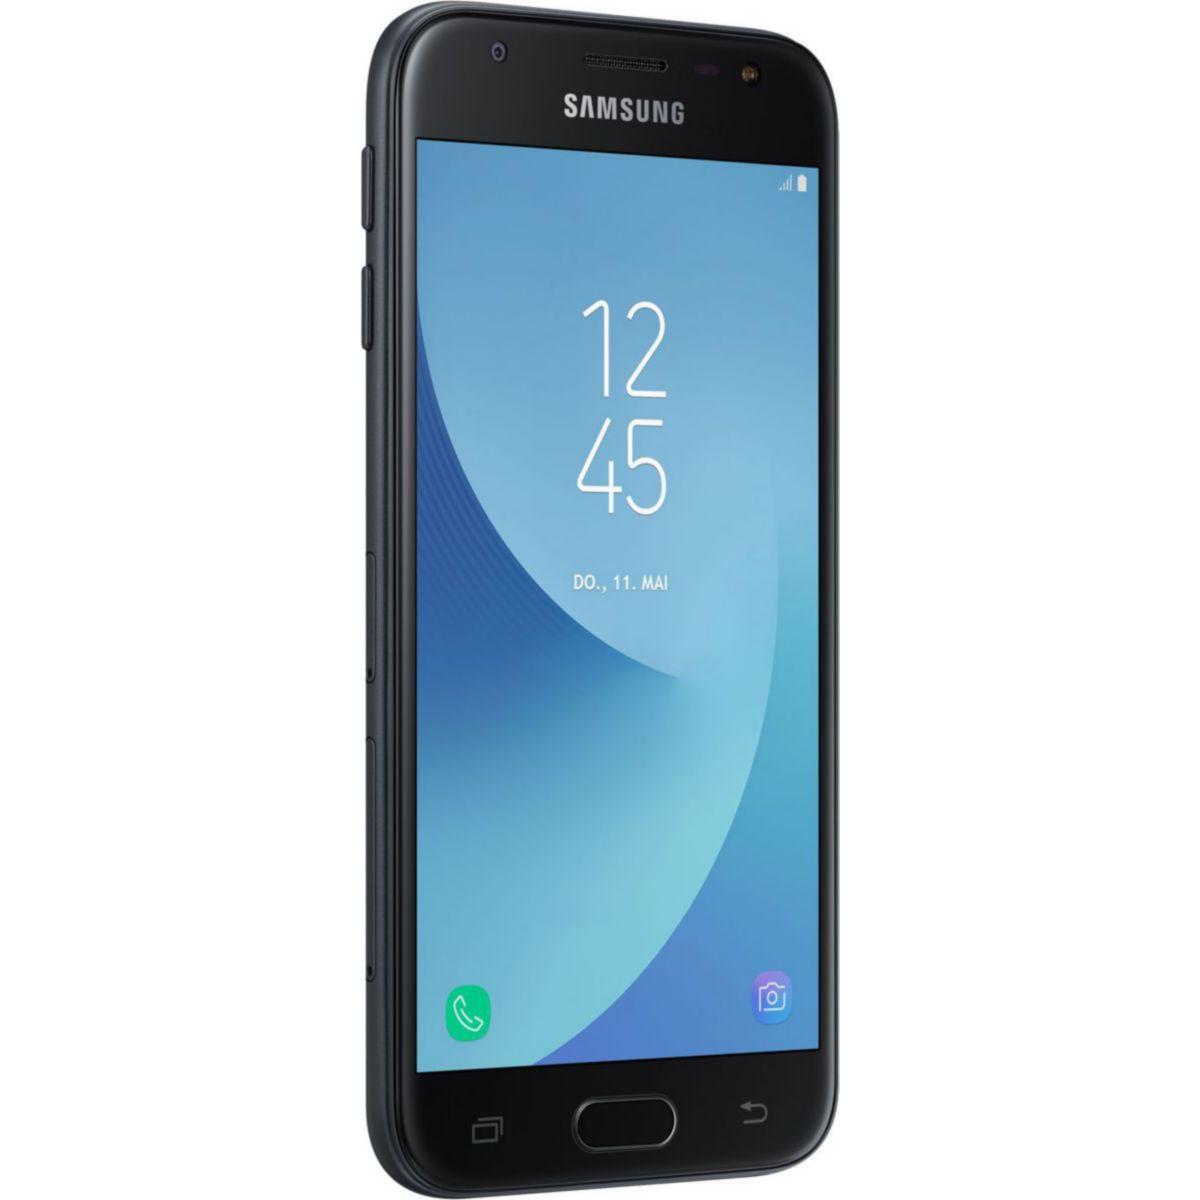 Samsung Galaxy J3 Duos SM-J330F (2017) Smartphone Black jetztbilligerkaufen